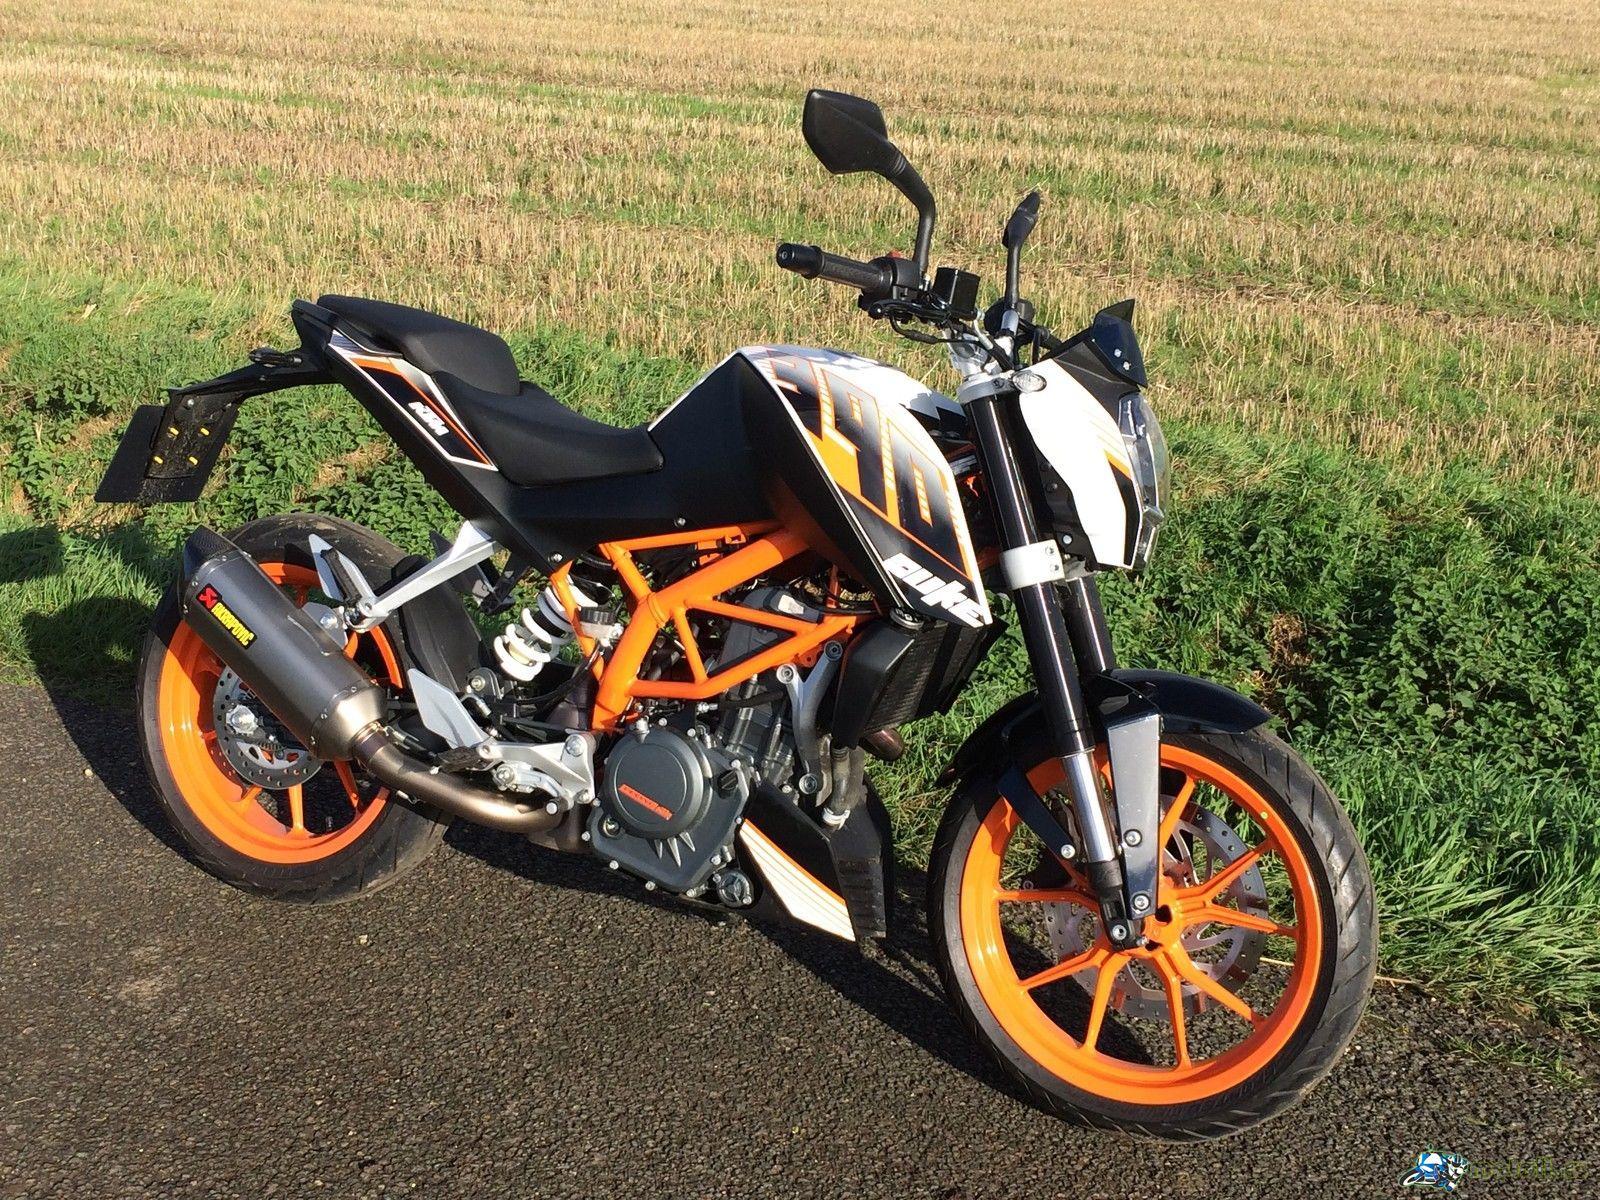 Обзор мотоцикла KTM Duke 390